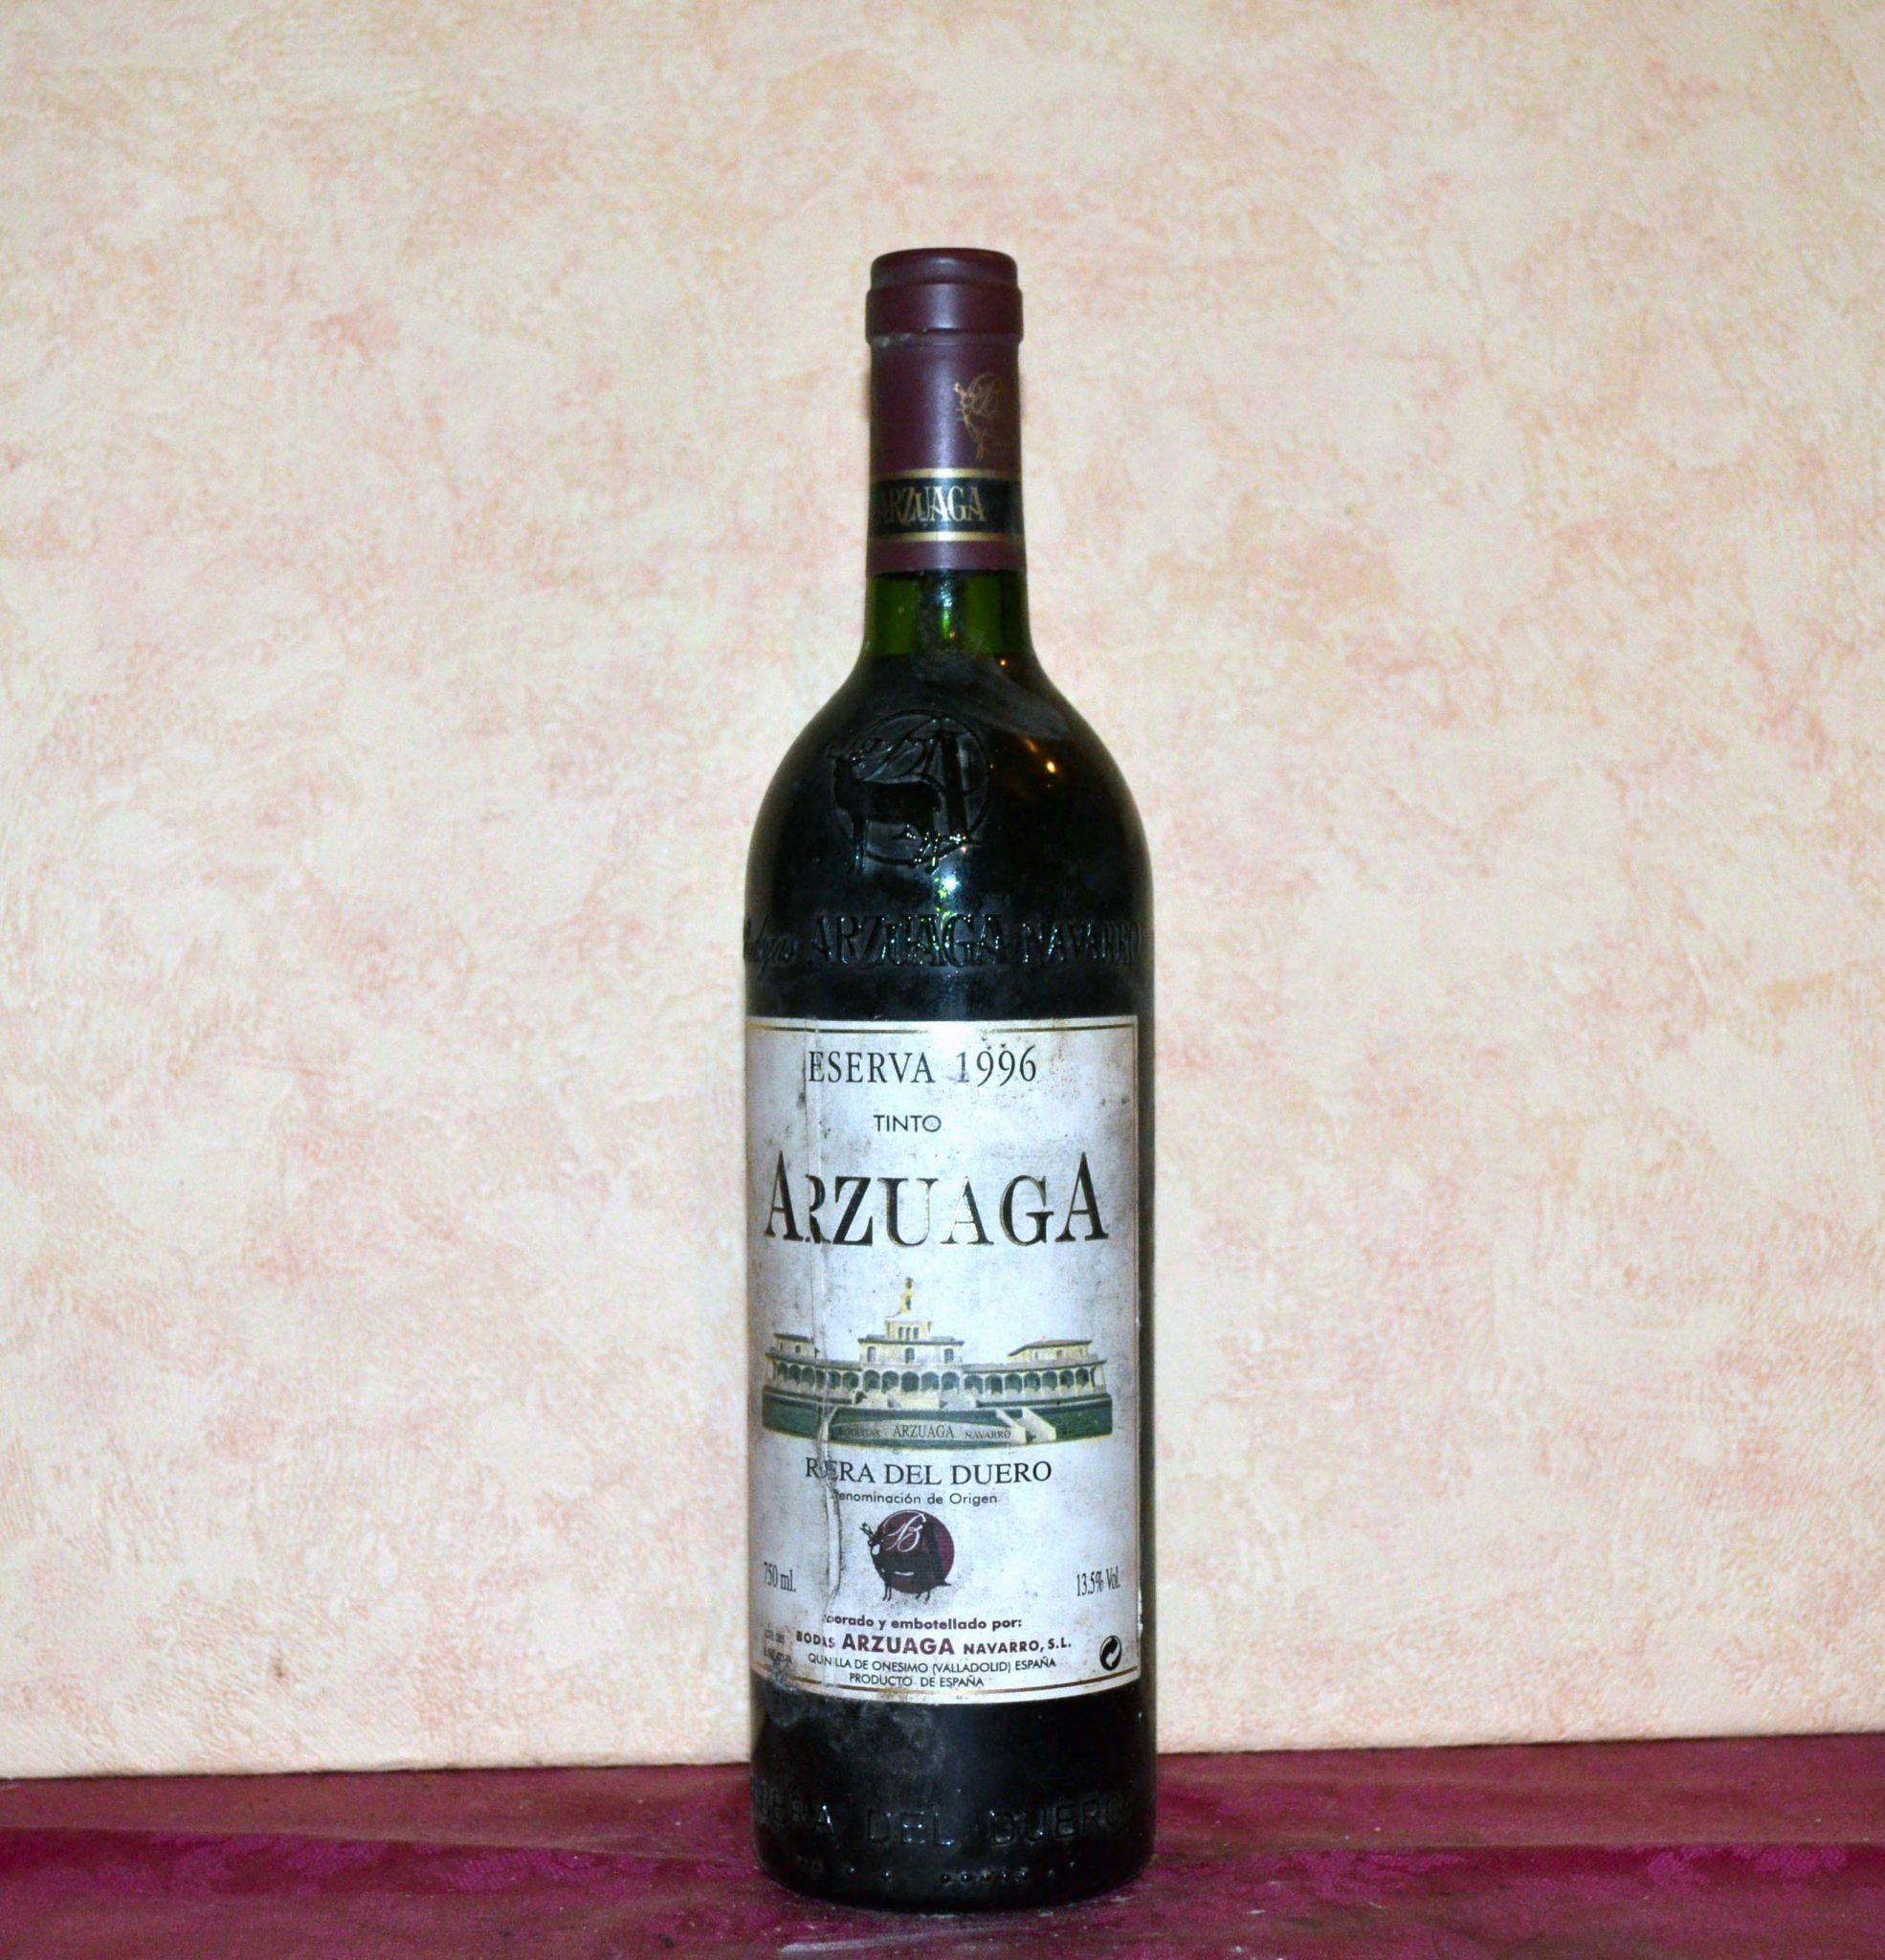 Arzuaga Reserve 1996